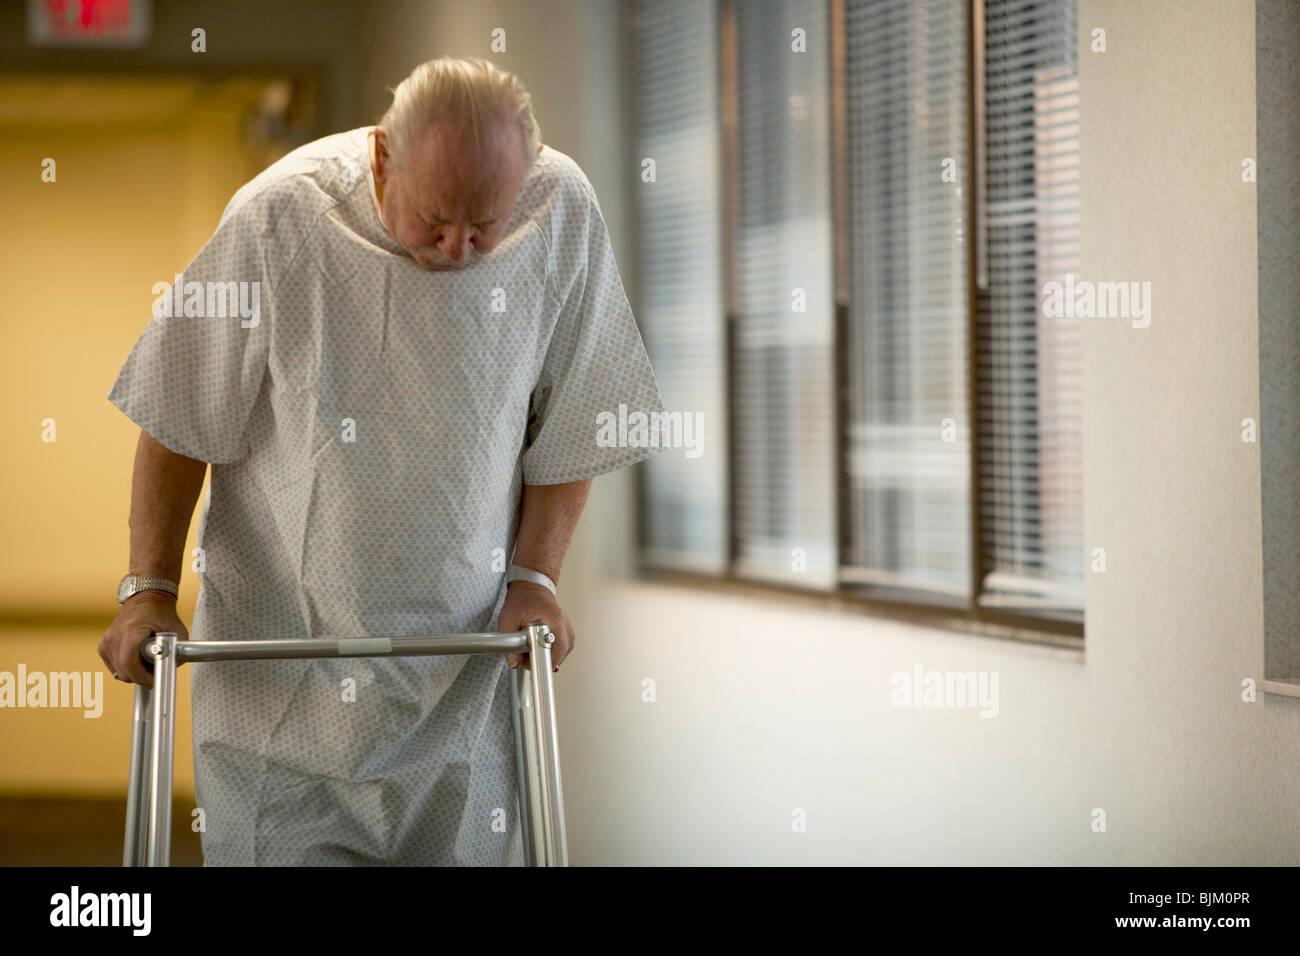 Hombre maduro en bata de hospital con walker Imagen De Stock